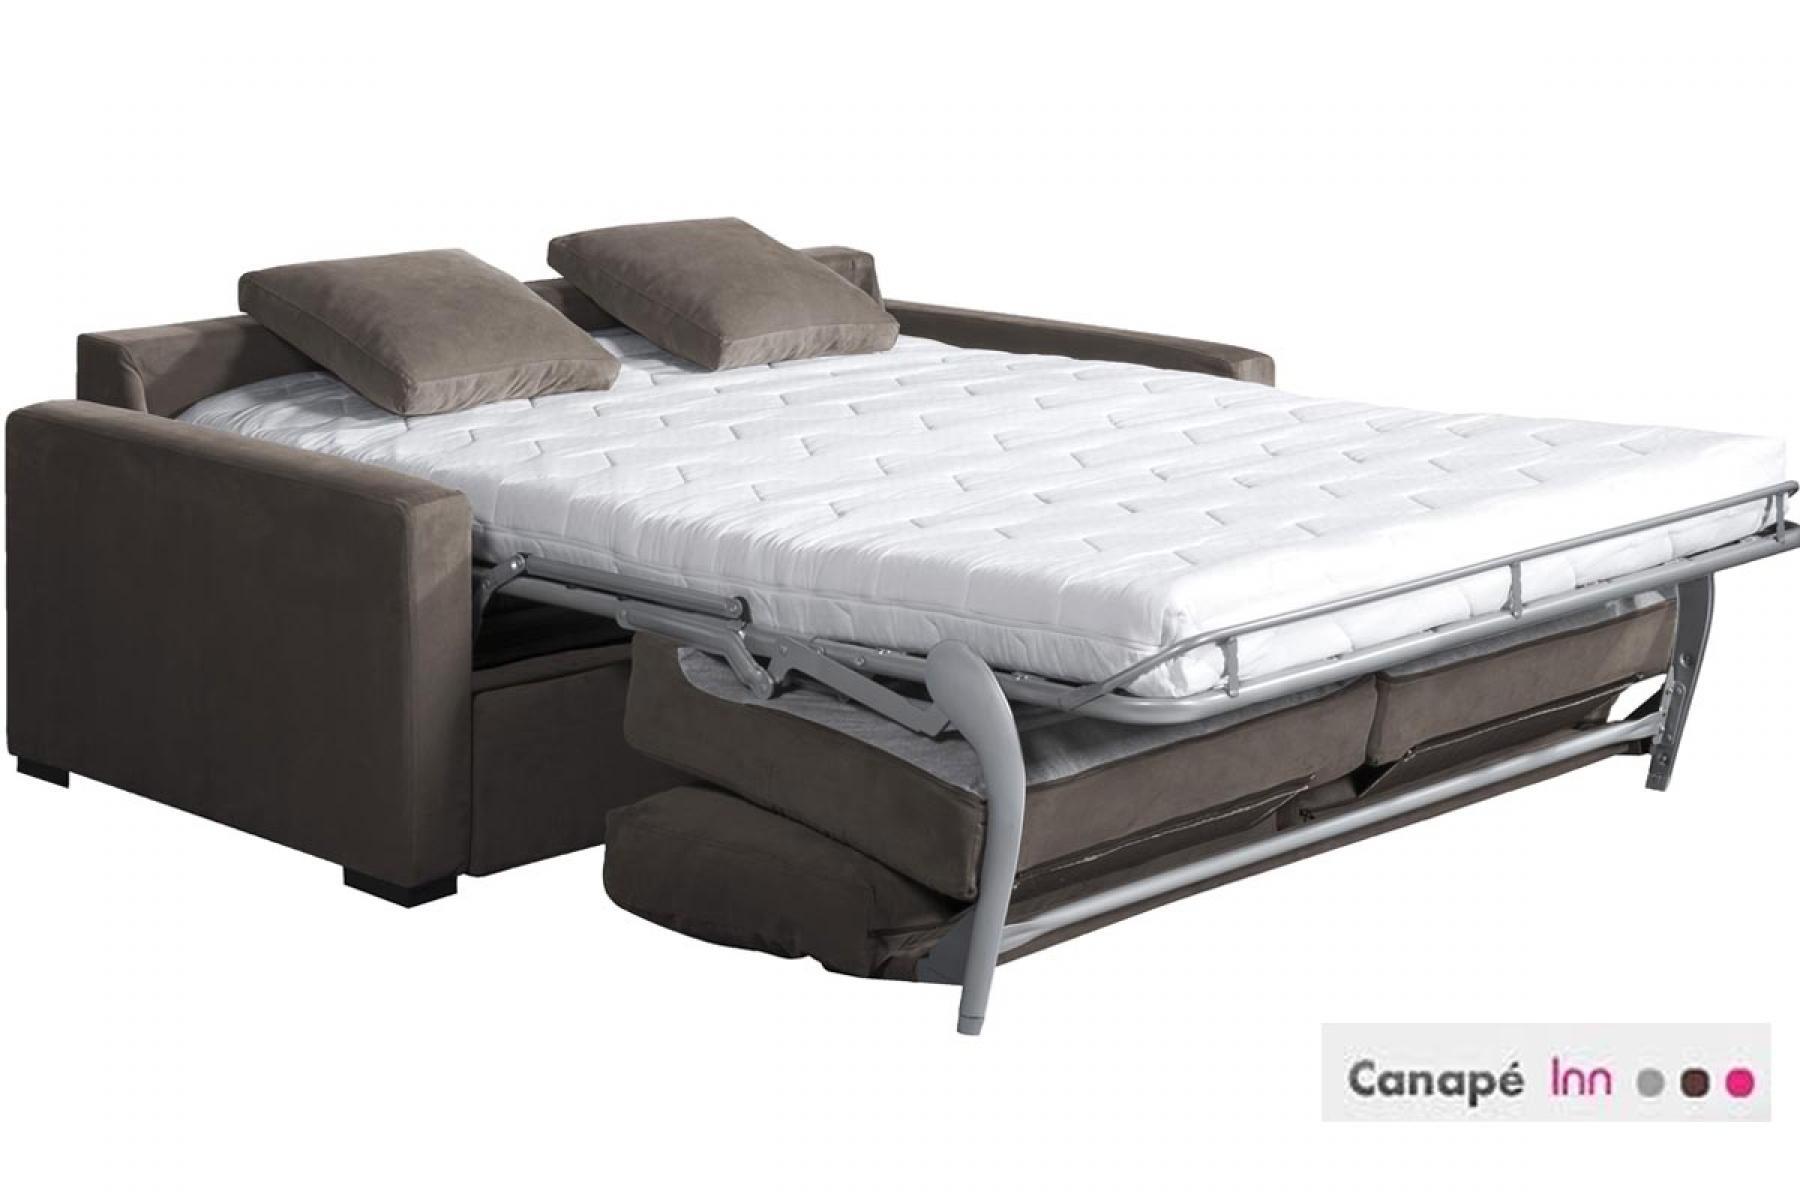 photos canap lit. Black Bedroom Furniture Sets. Home Design Ideas